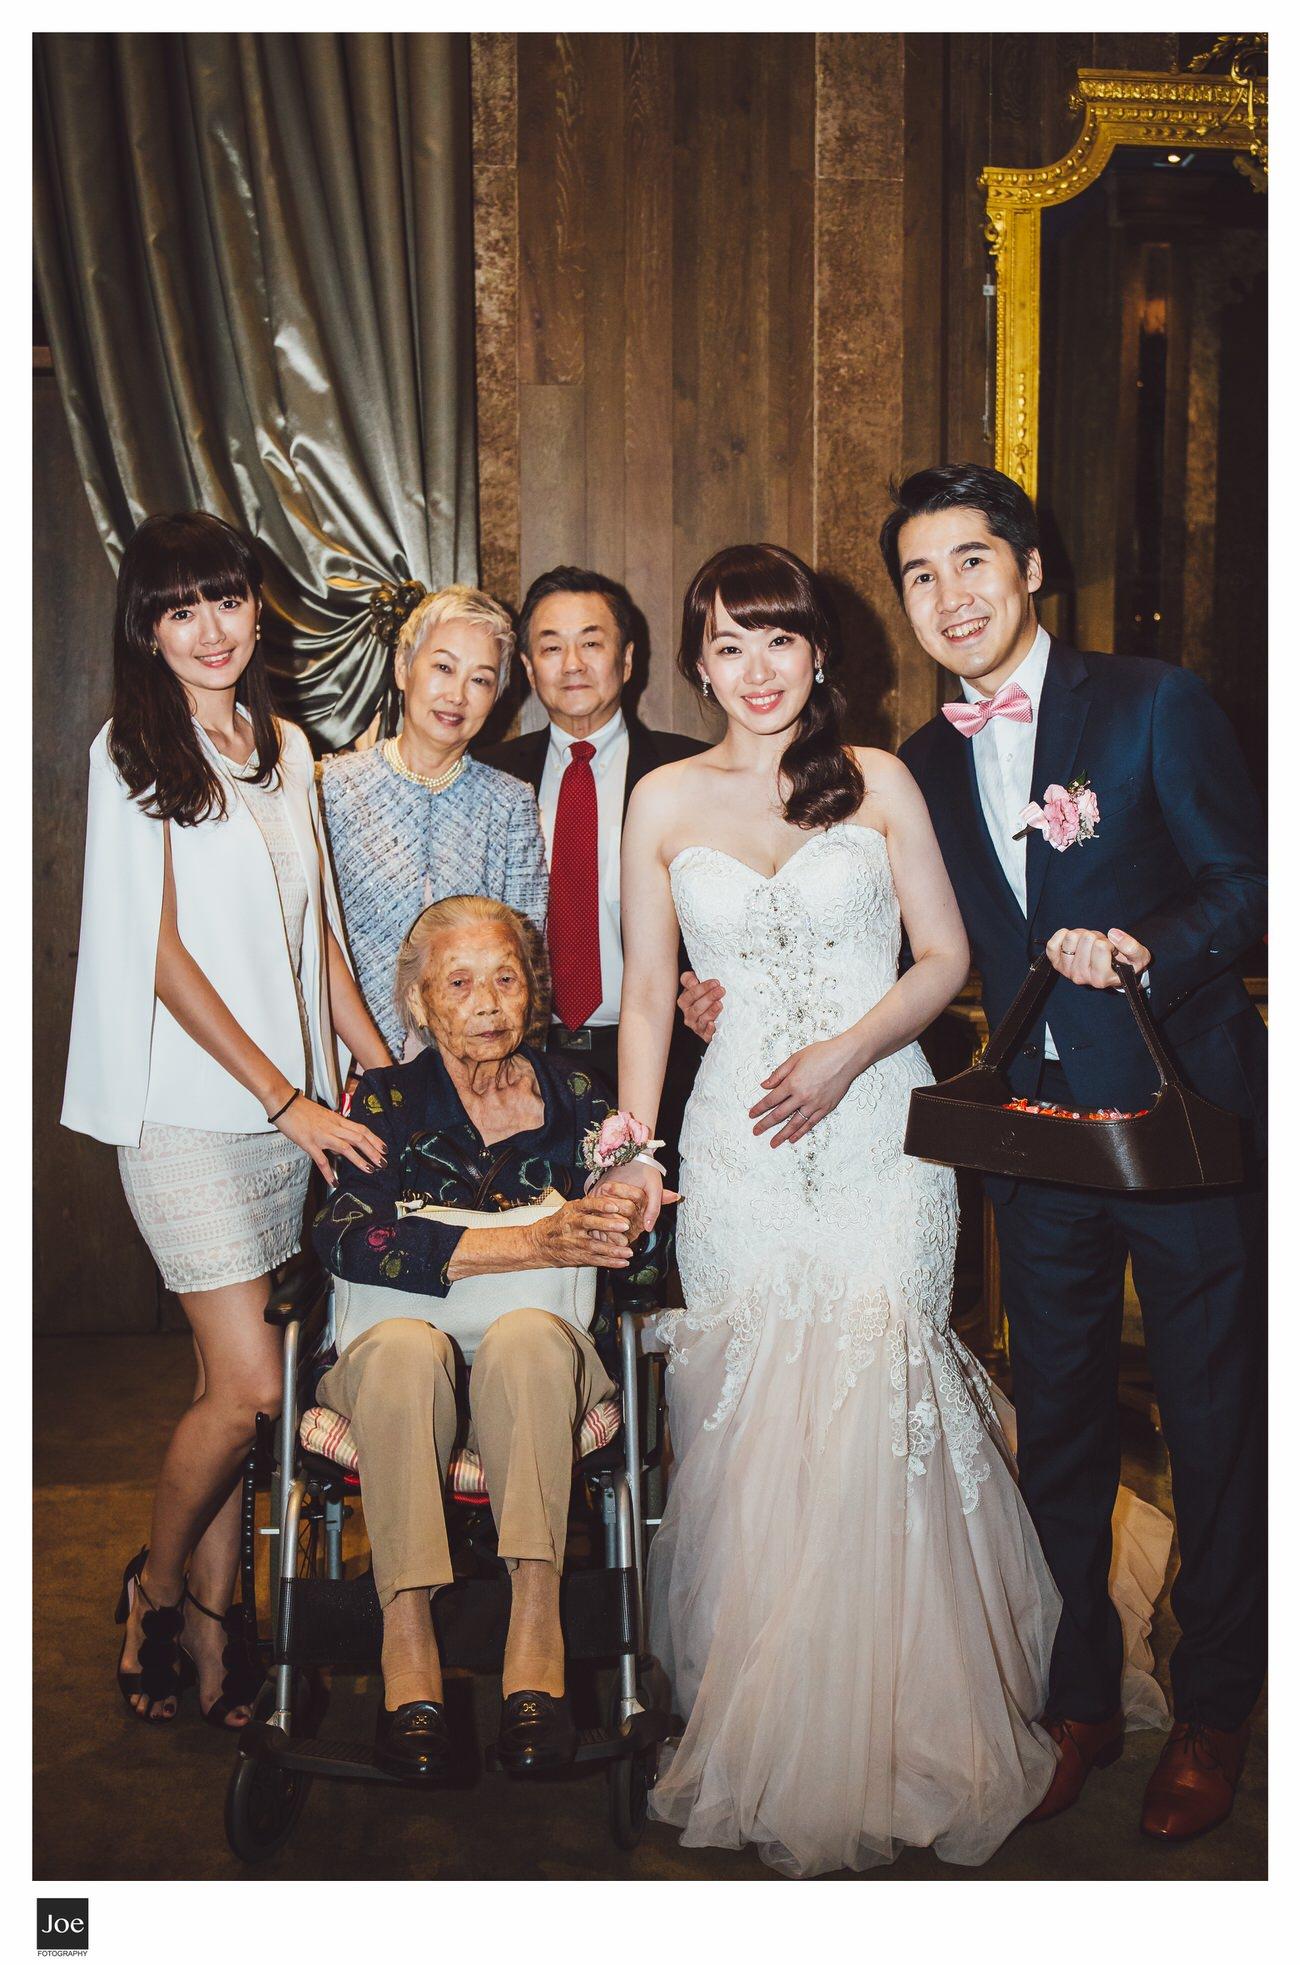 joe-fotography-wedding-photo-palais-de-chine-hotel-069.jpg